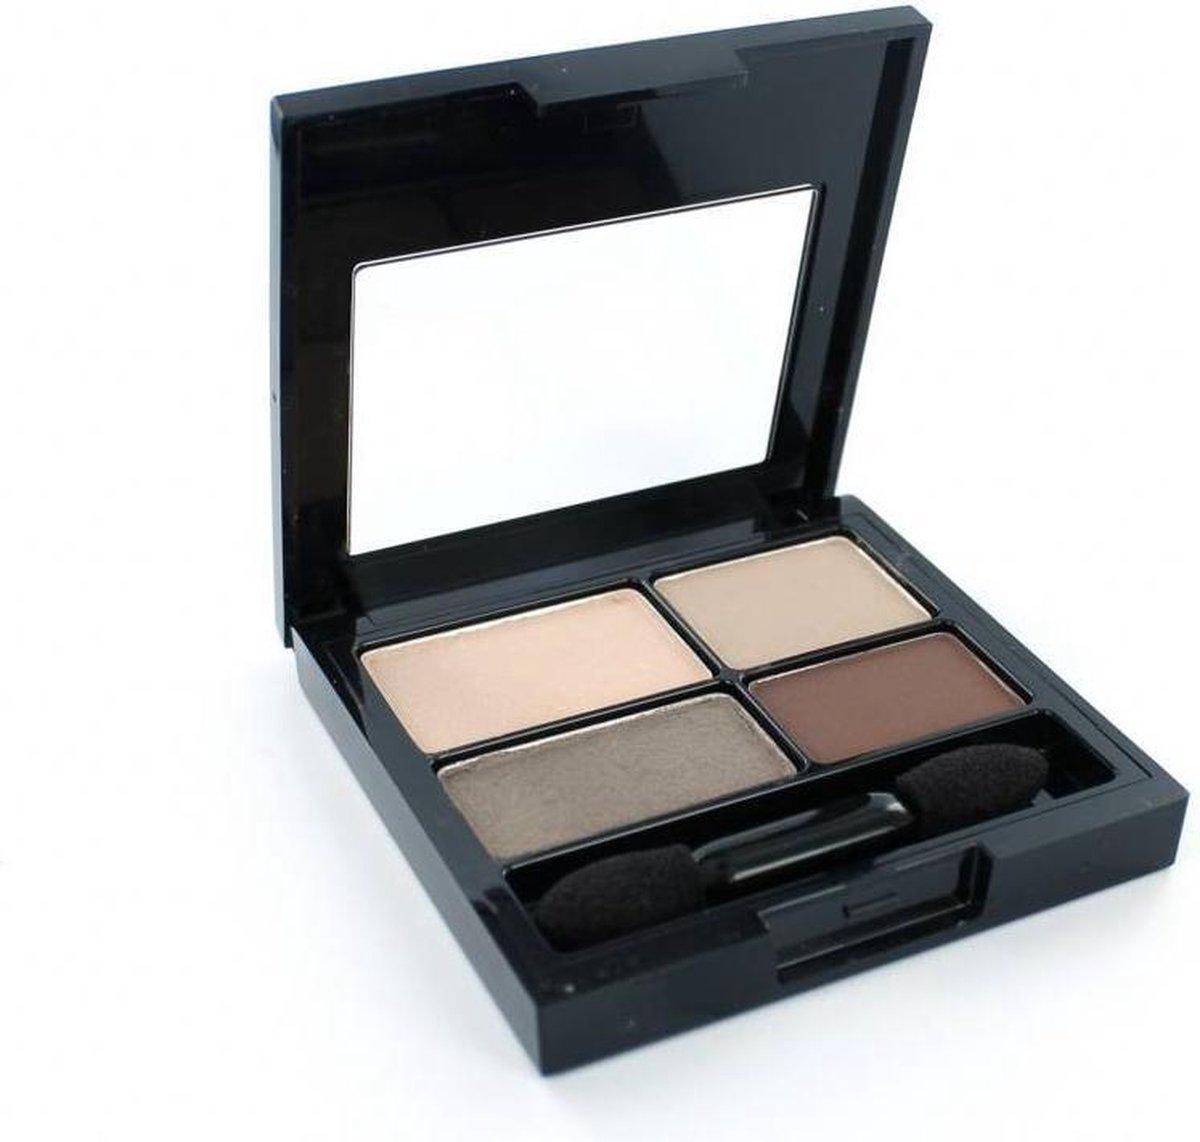 Revlon 16H ColorStay Quad - 500 Addictive - Bruin - Oogschaduw - Revlon